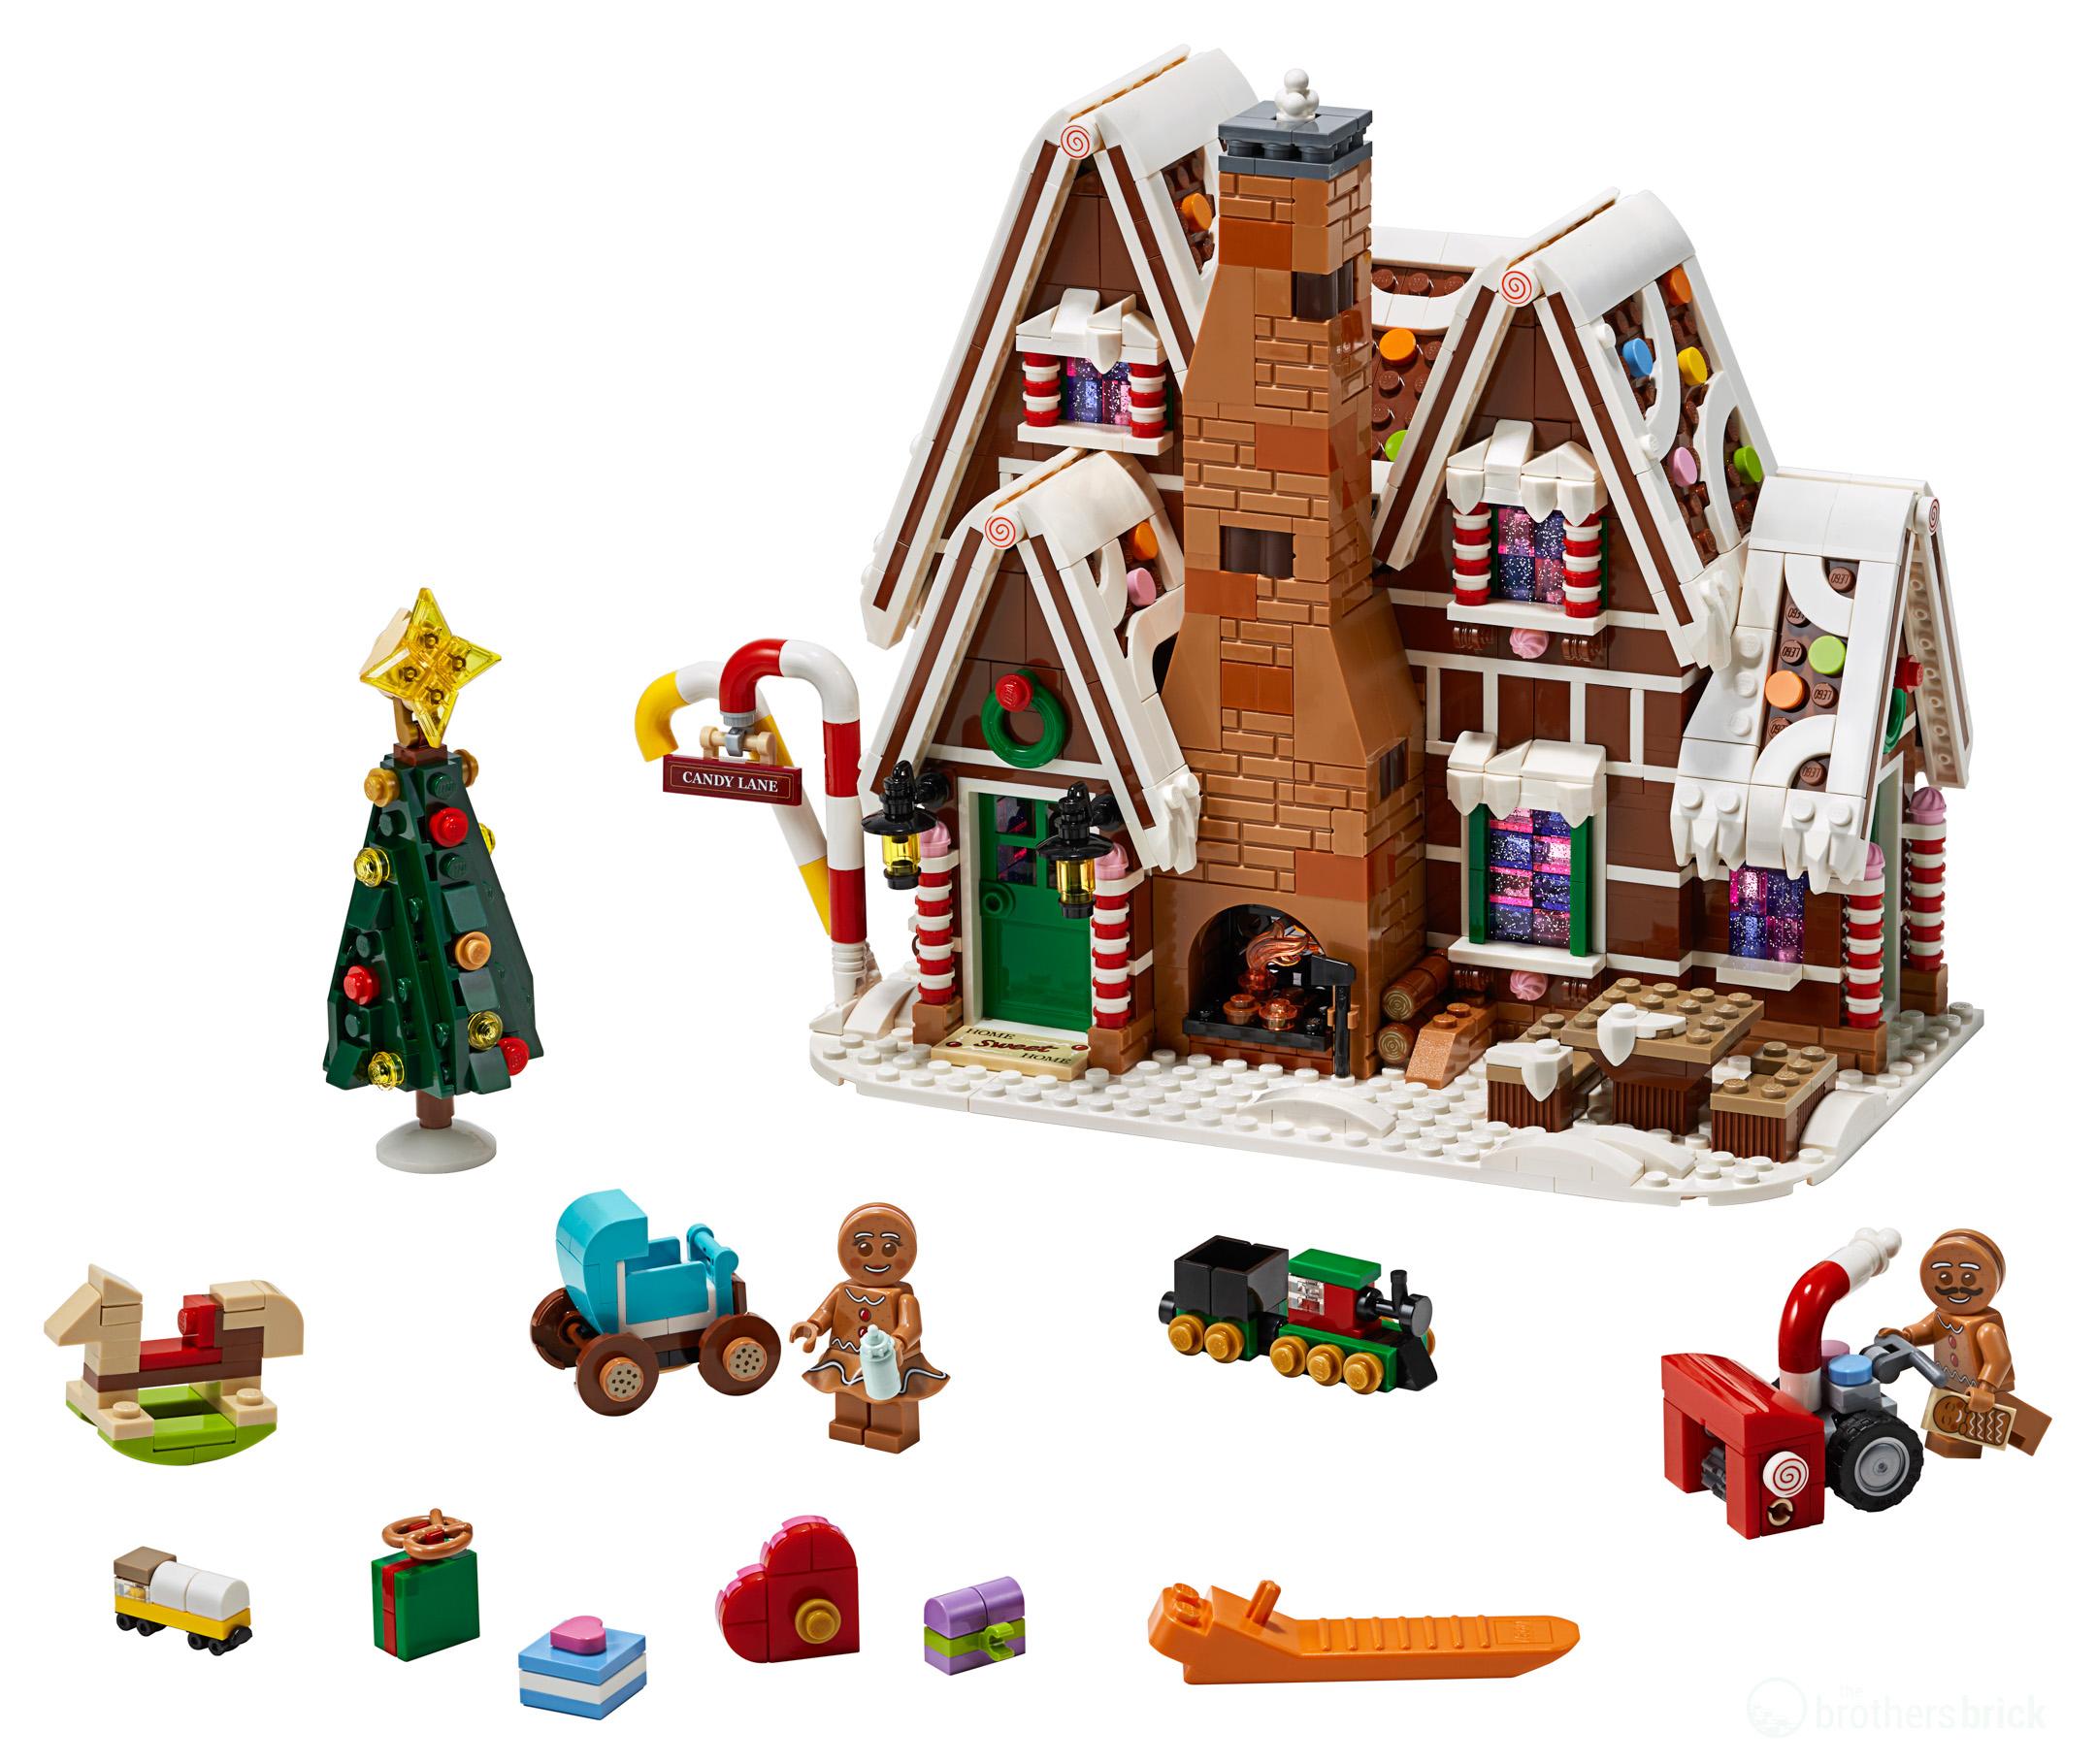 Lego Christmas Set 2019.Lego Celebrates 10 Years Of The Winter Village With 10267